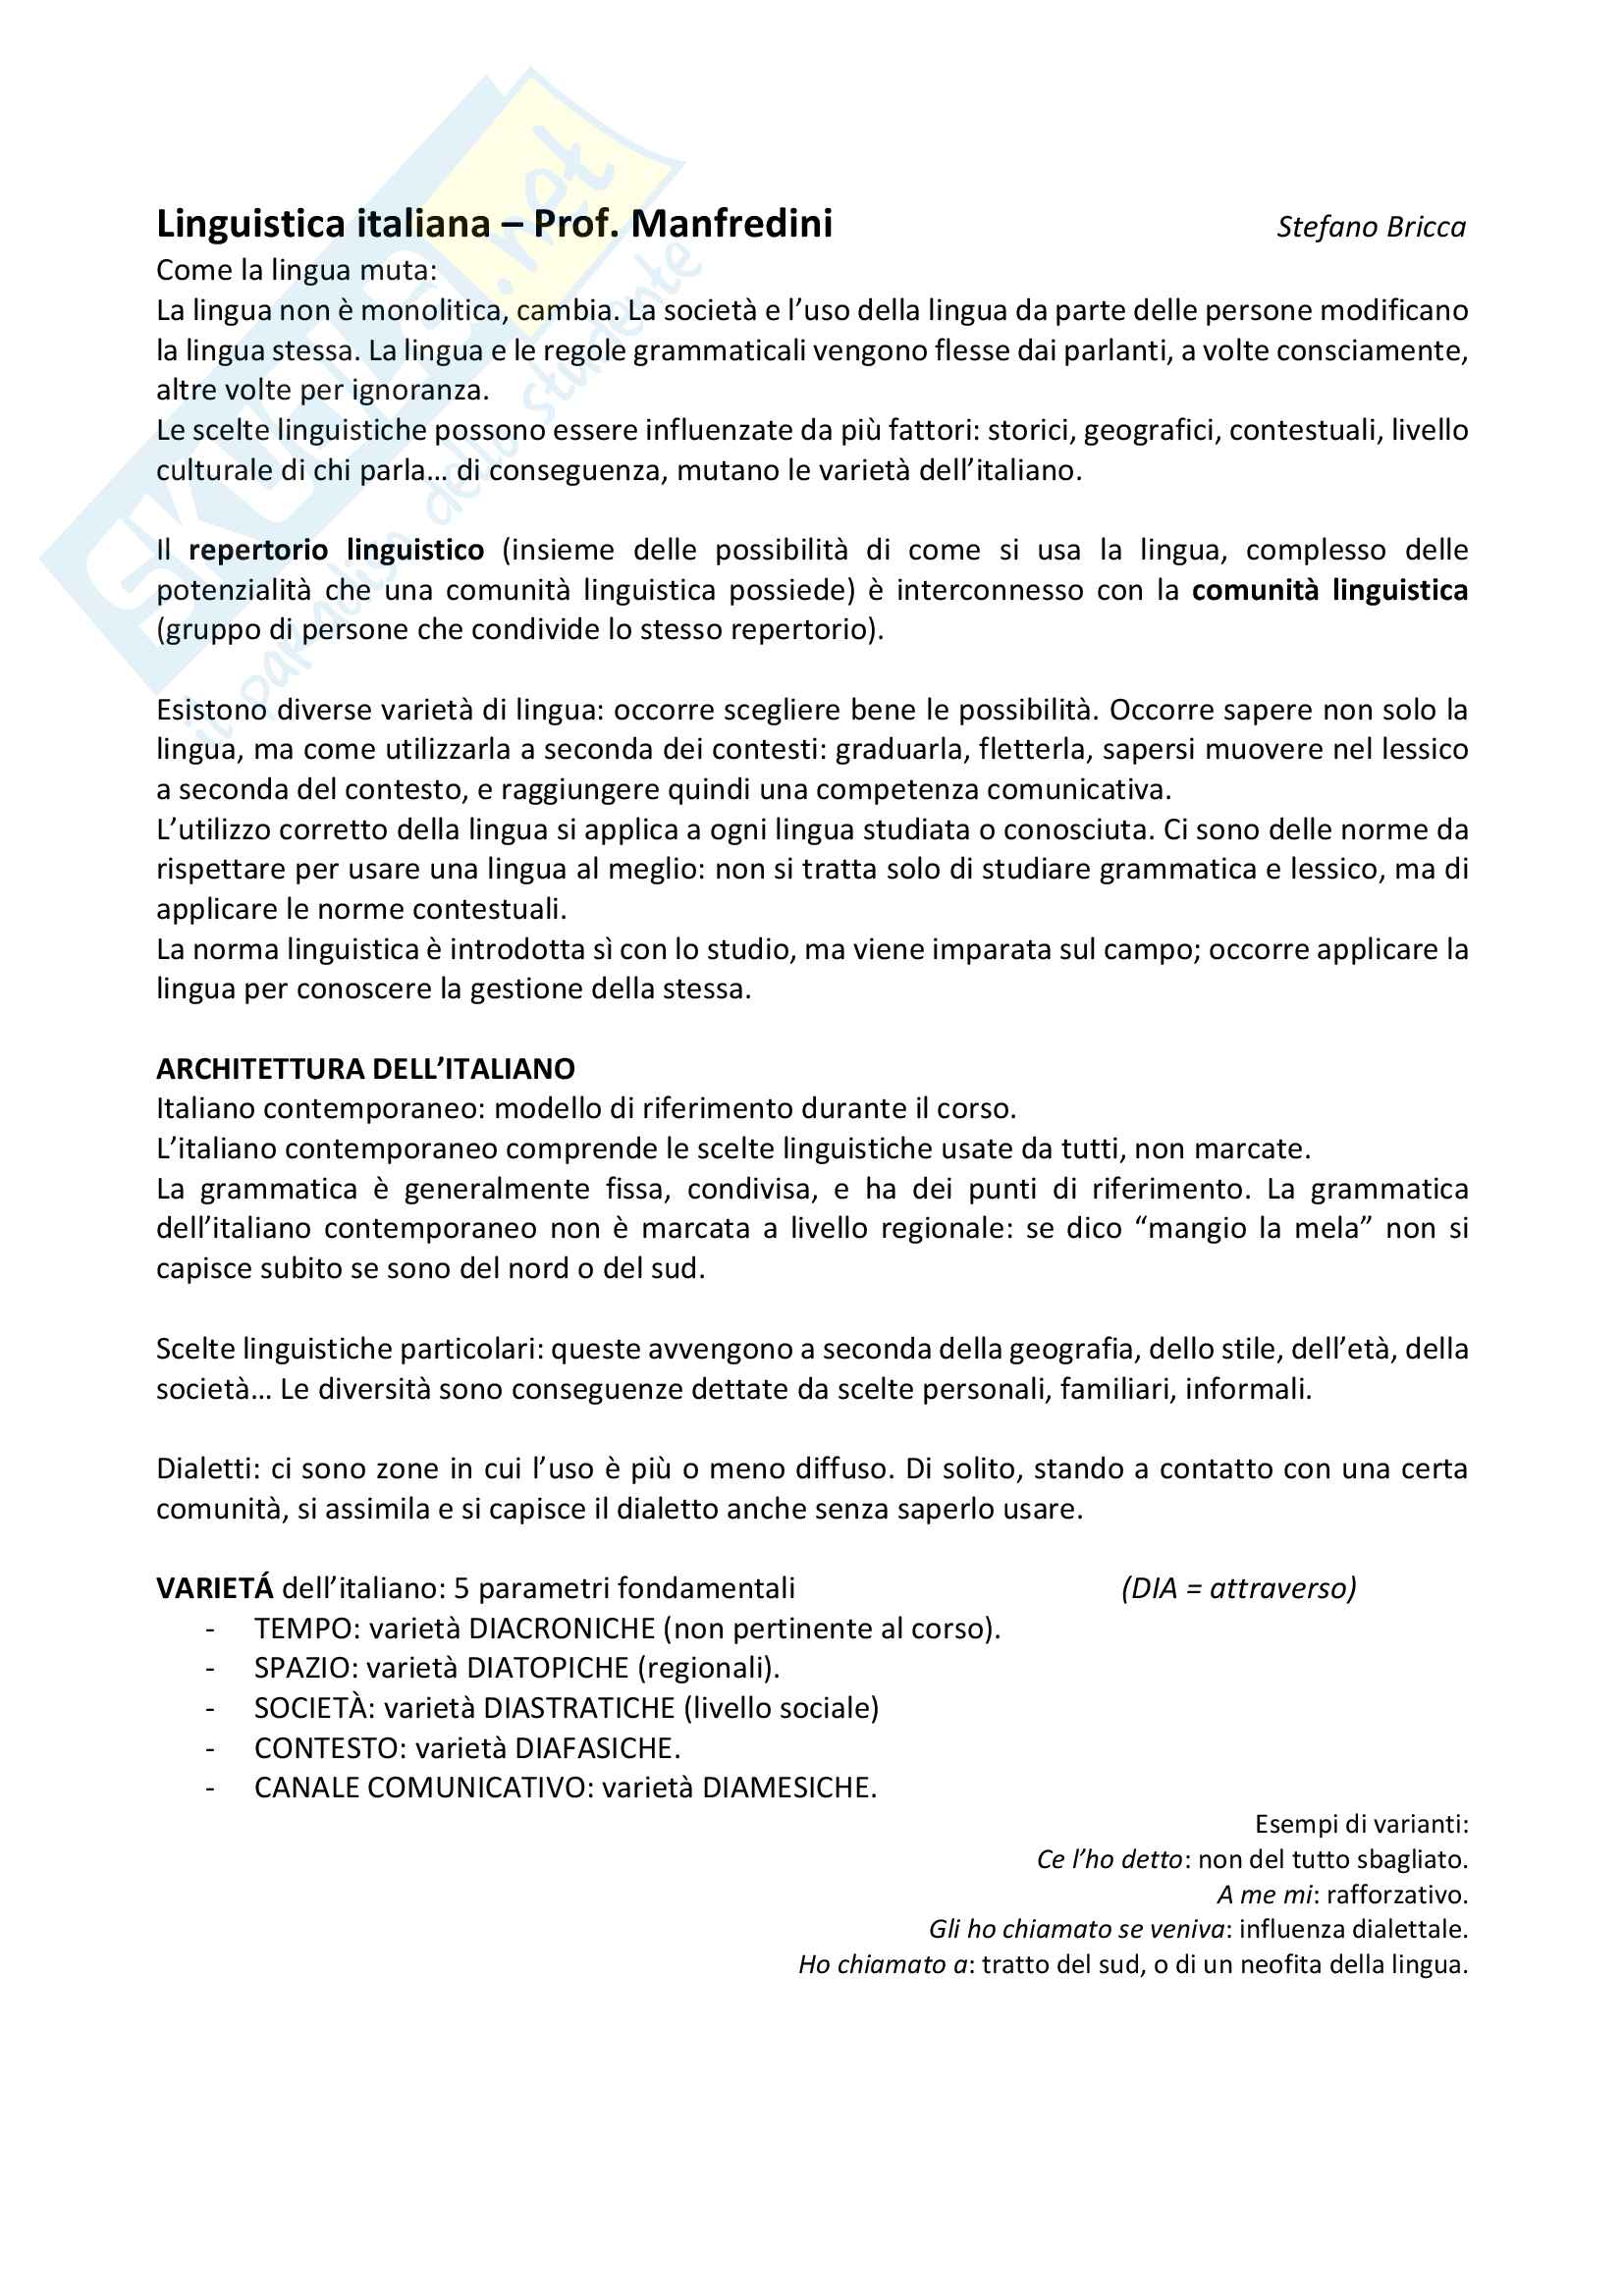 Appunti completi per esame di Linguistica italiana prof Manfredini Unige 2016 2017